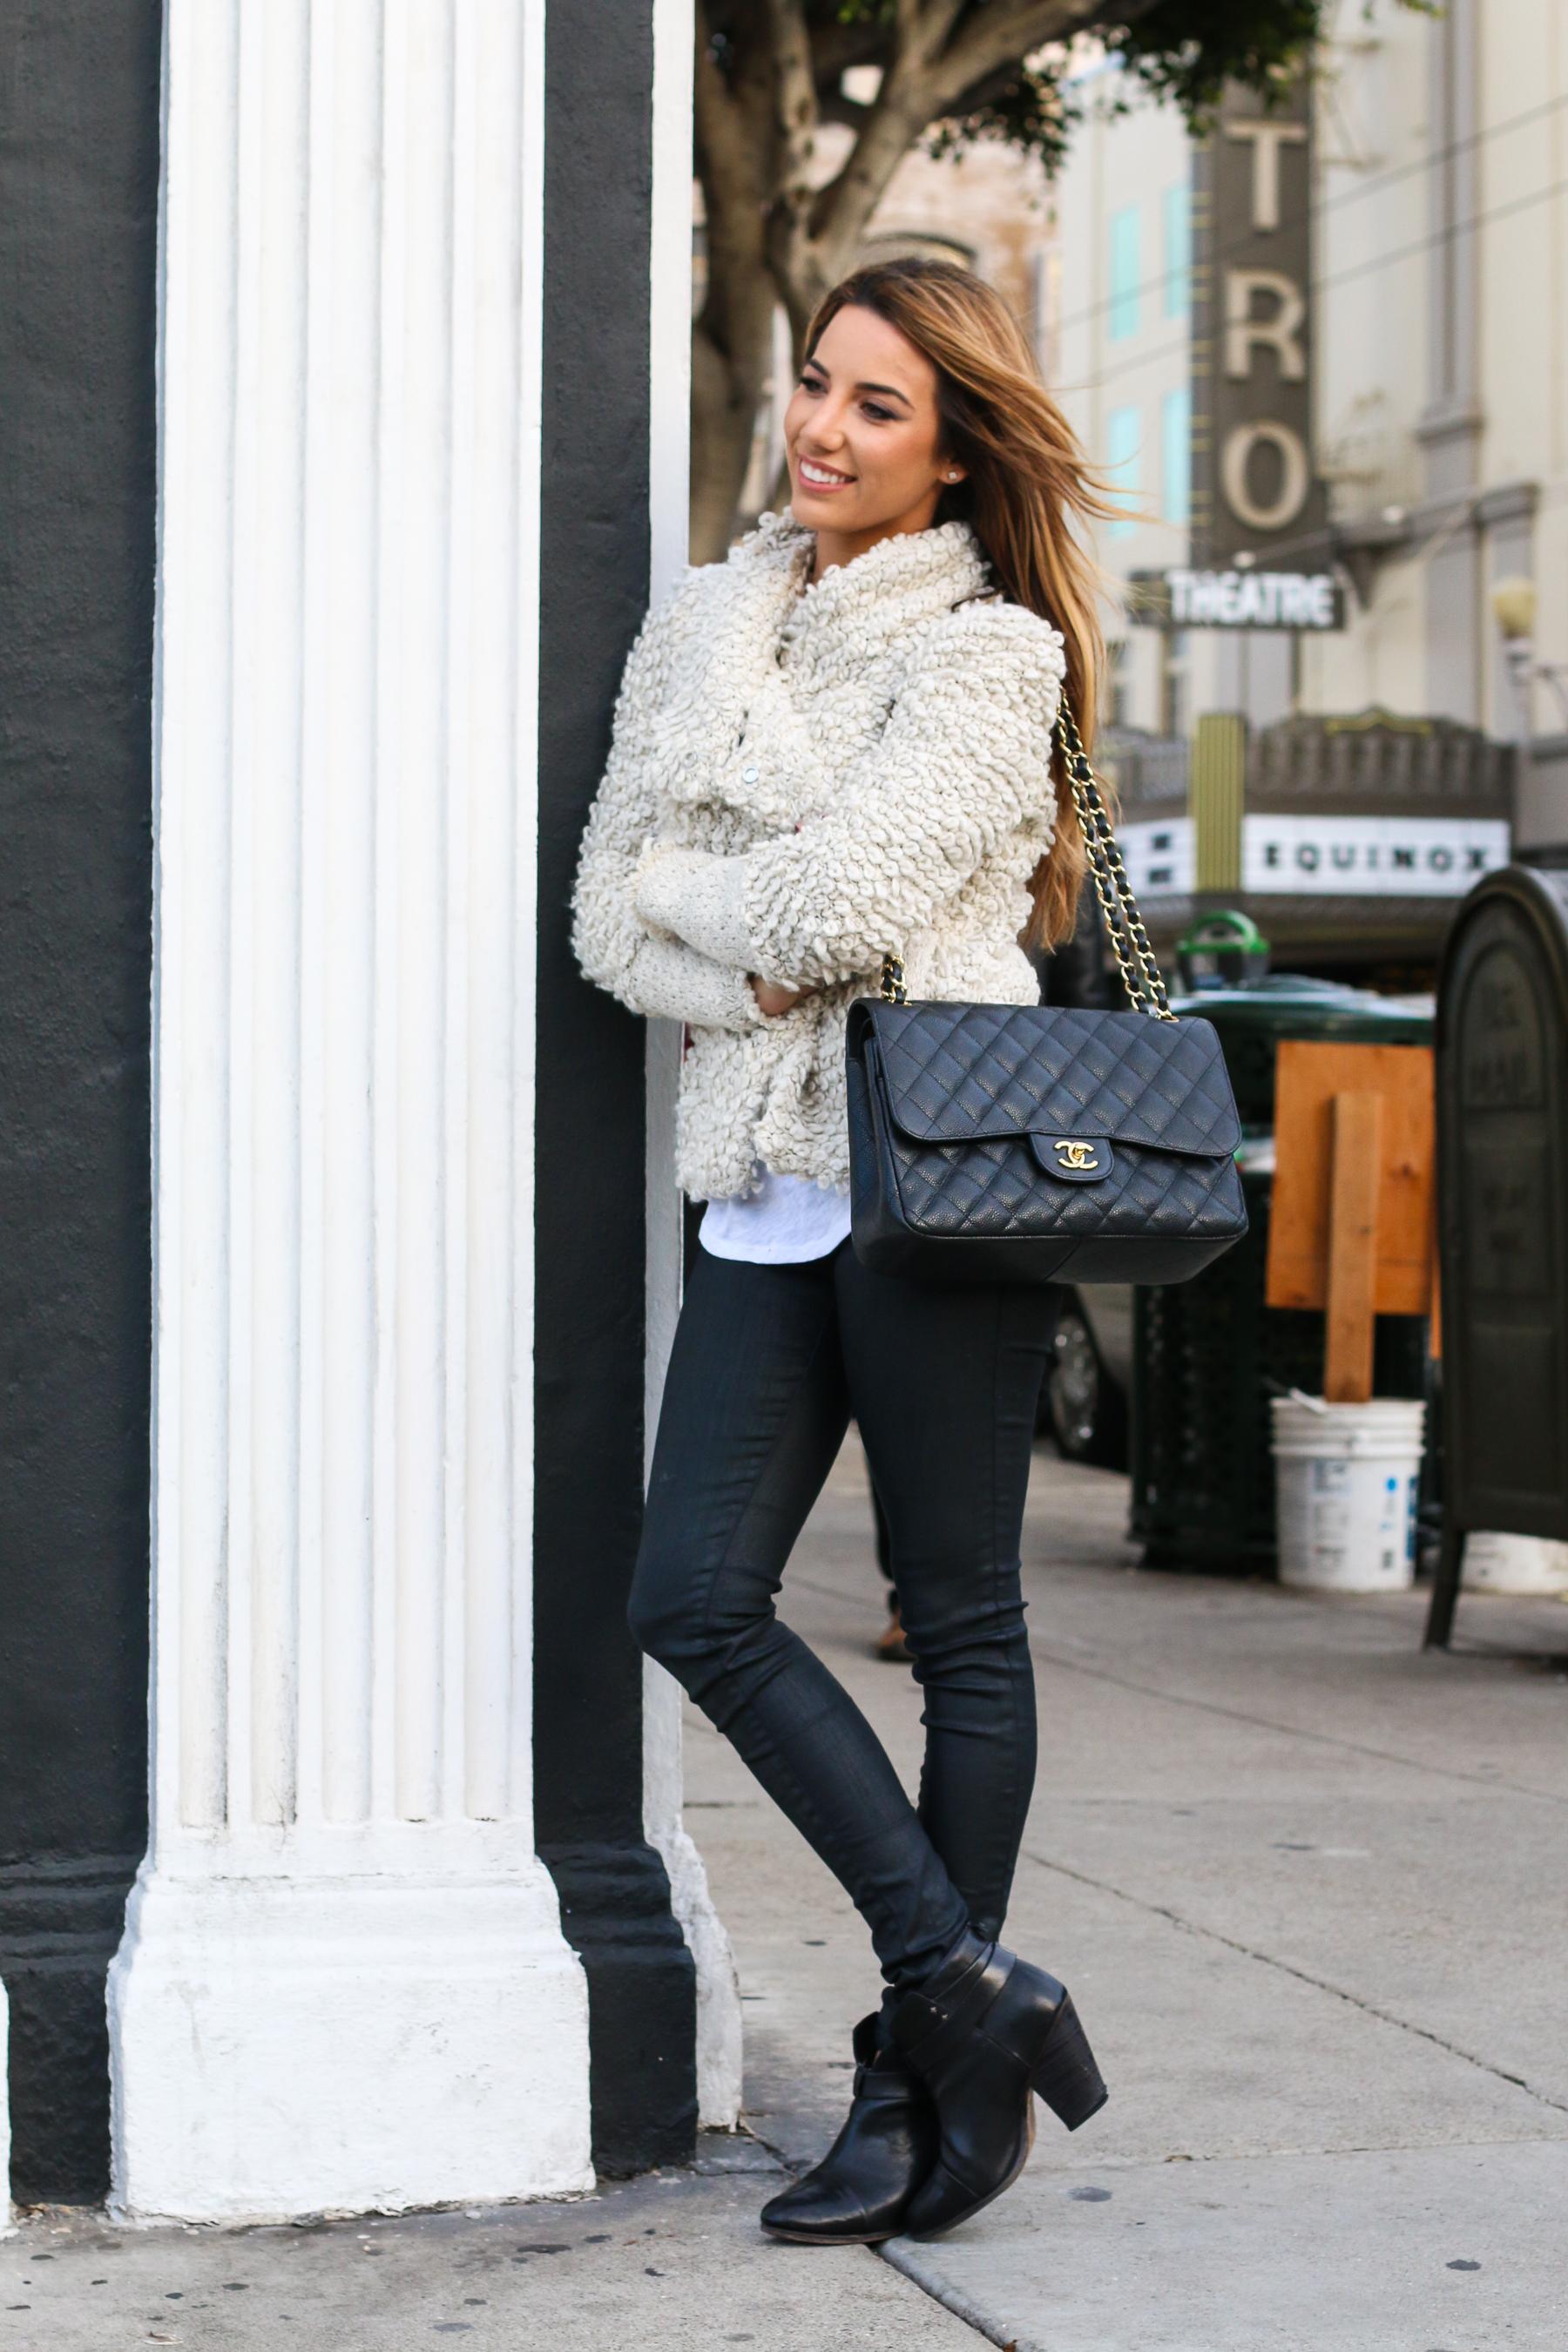 Ariana-Lauren-Fashion-Born-Blogger-Streetstyle-Photography-by-Ryan-Chua-2006